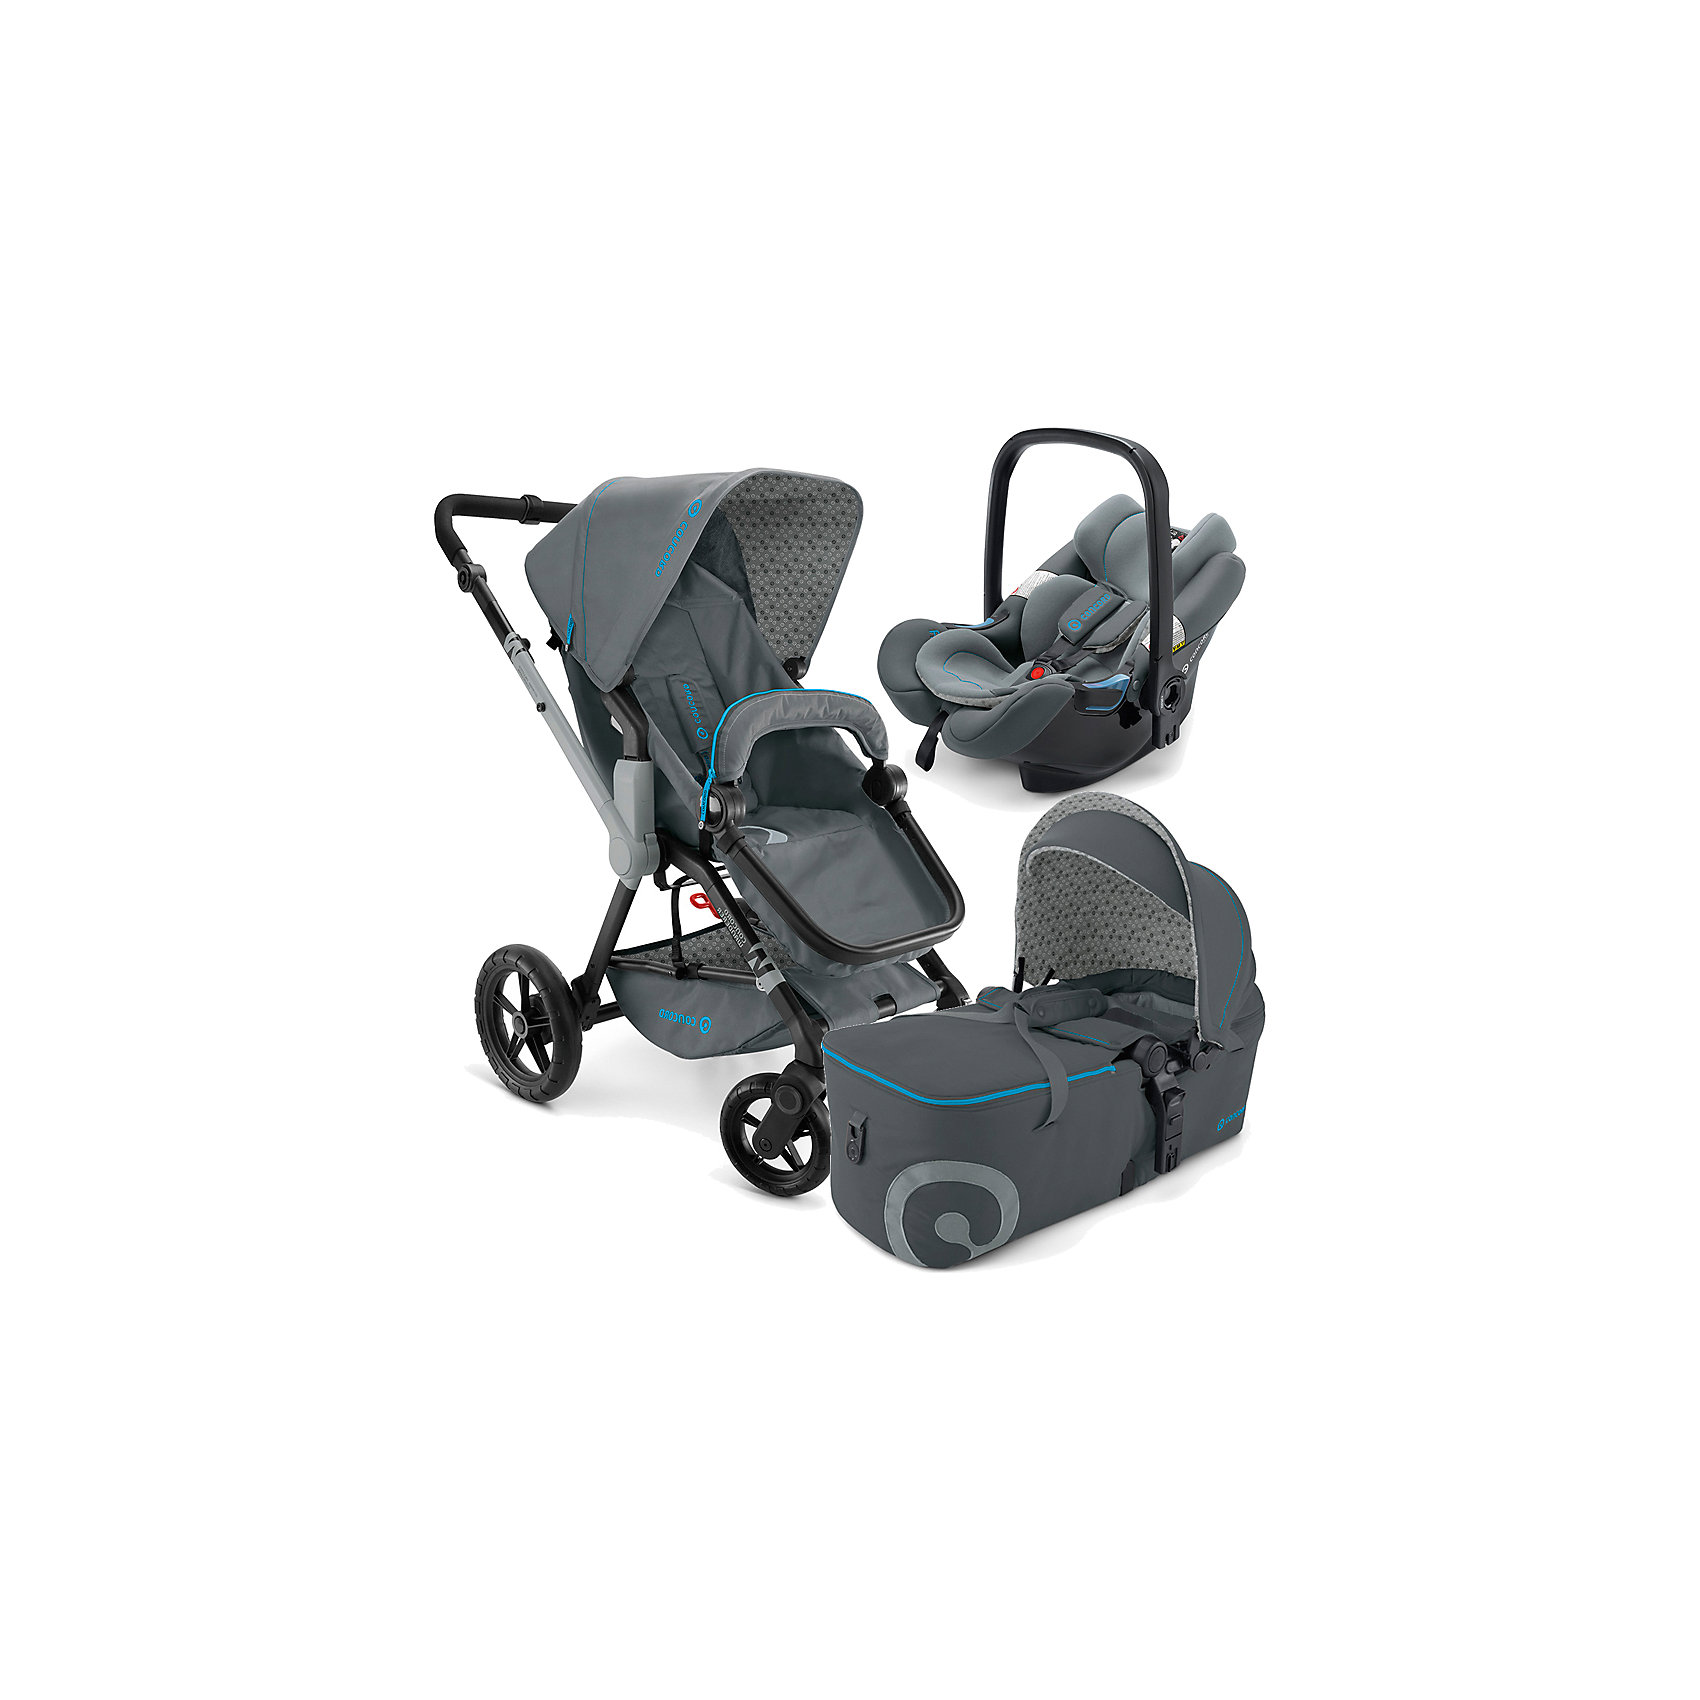 Concord Коляска 3 в 1 Wanderer Mobility Set, Concord, Stone Grey 2015 все цены